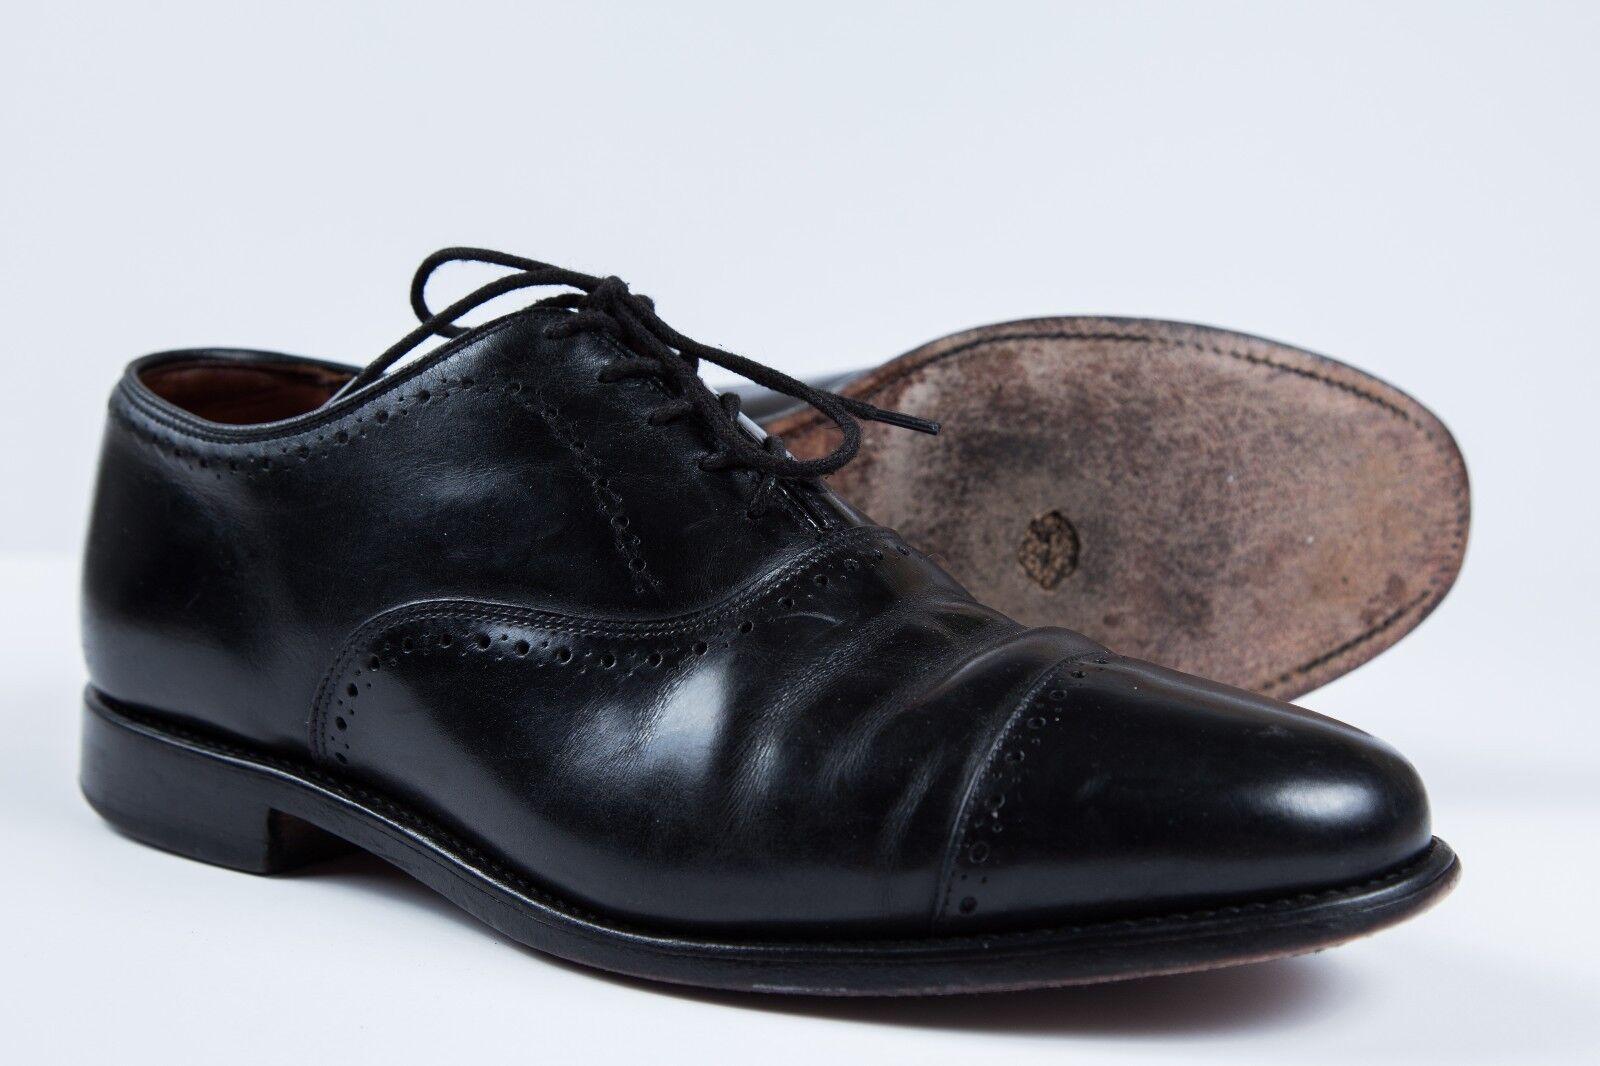 Men's Allen Edmonds Hale Black Cap Toe Oxfords Sz 8.5 EEE 3E